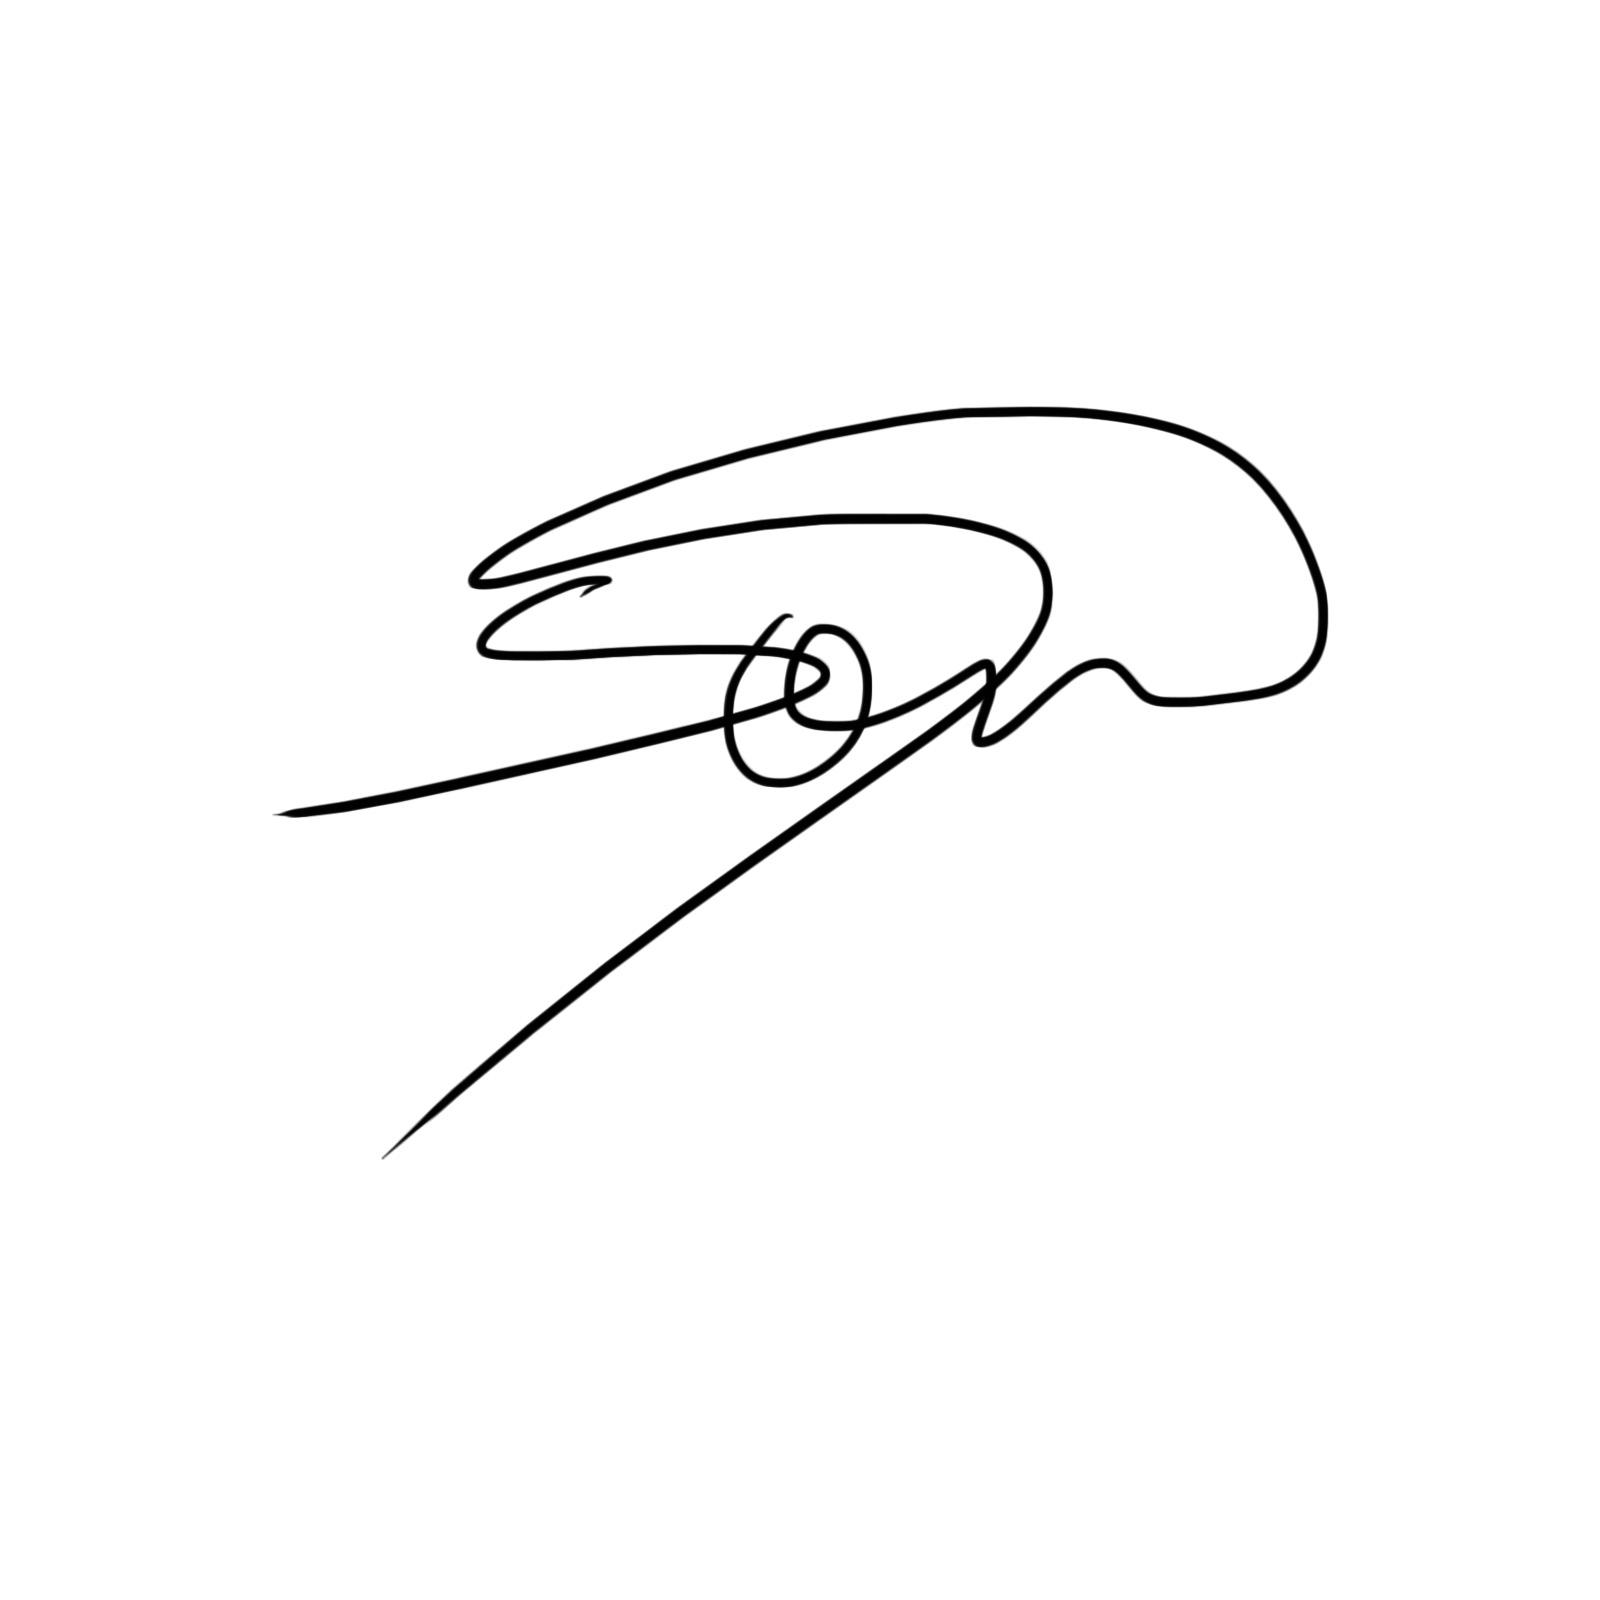 Samir Fakhri Signature